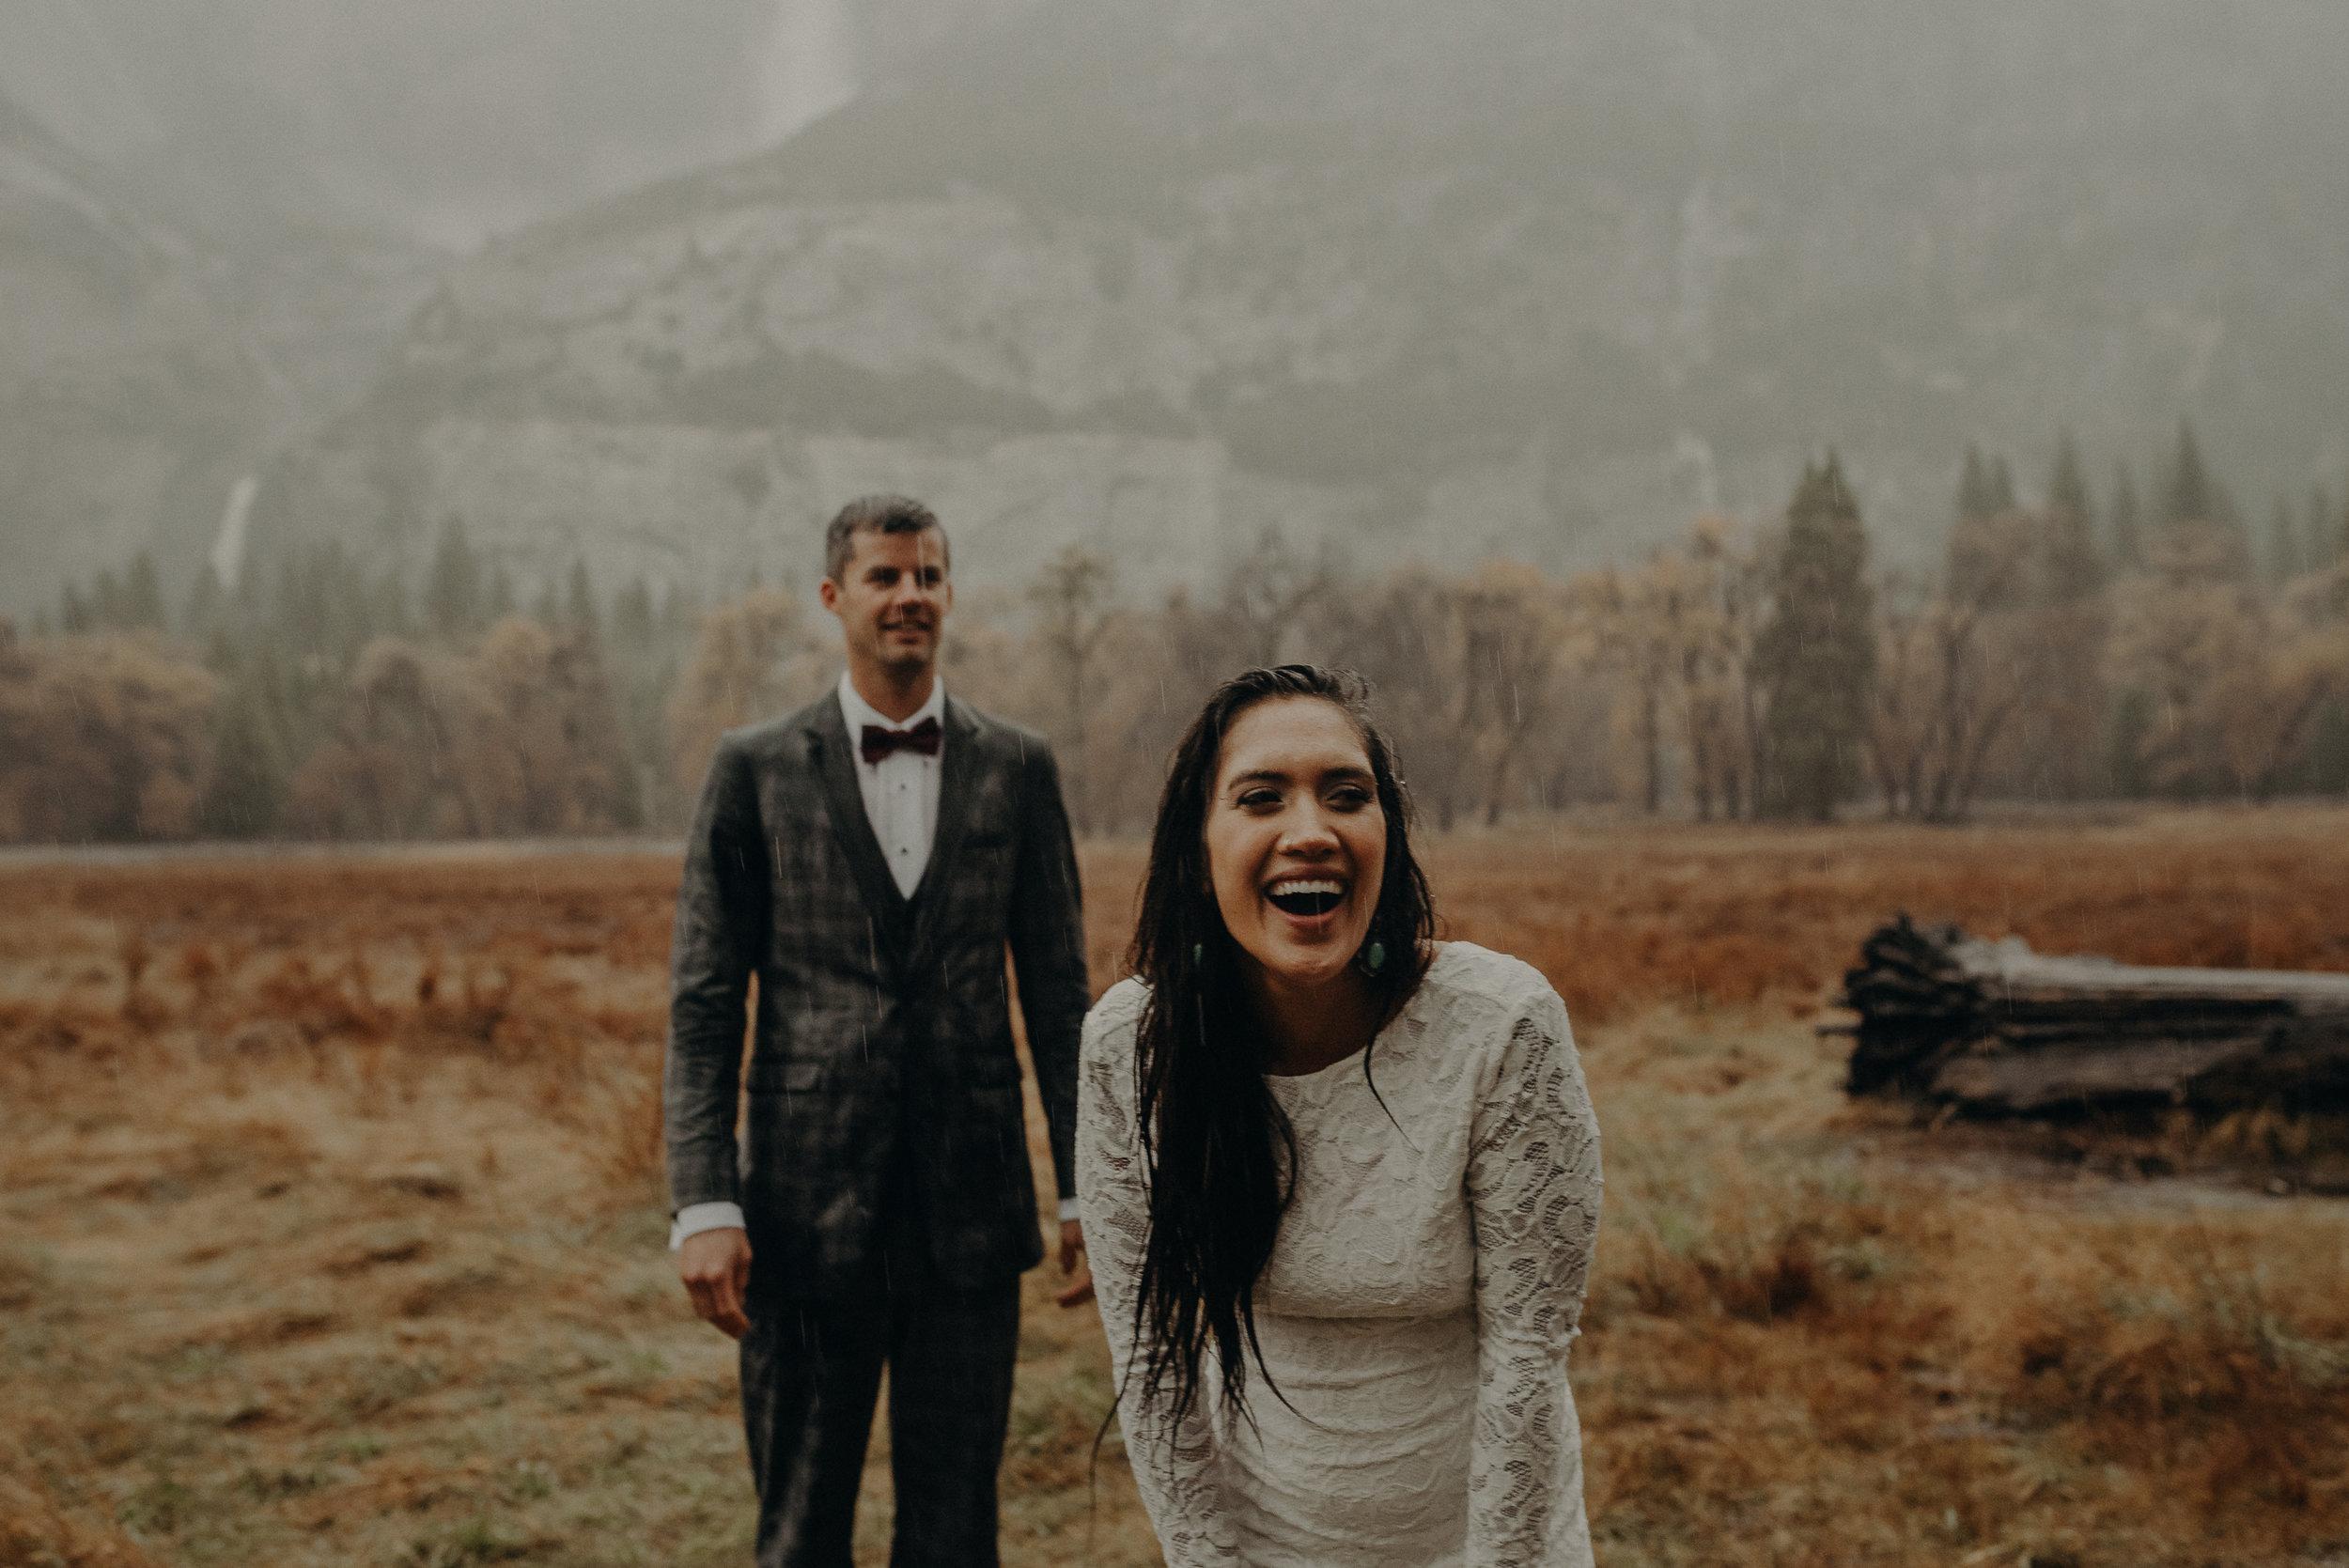 Isaiah + Taylor Photography - Yosemite Elopement - Los Angeles Wedding Photographer-57.jpg